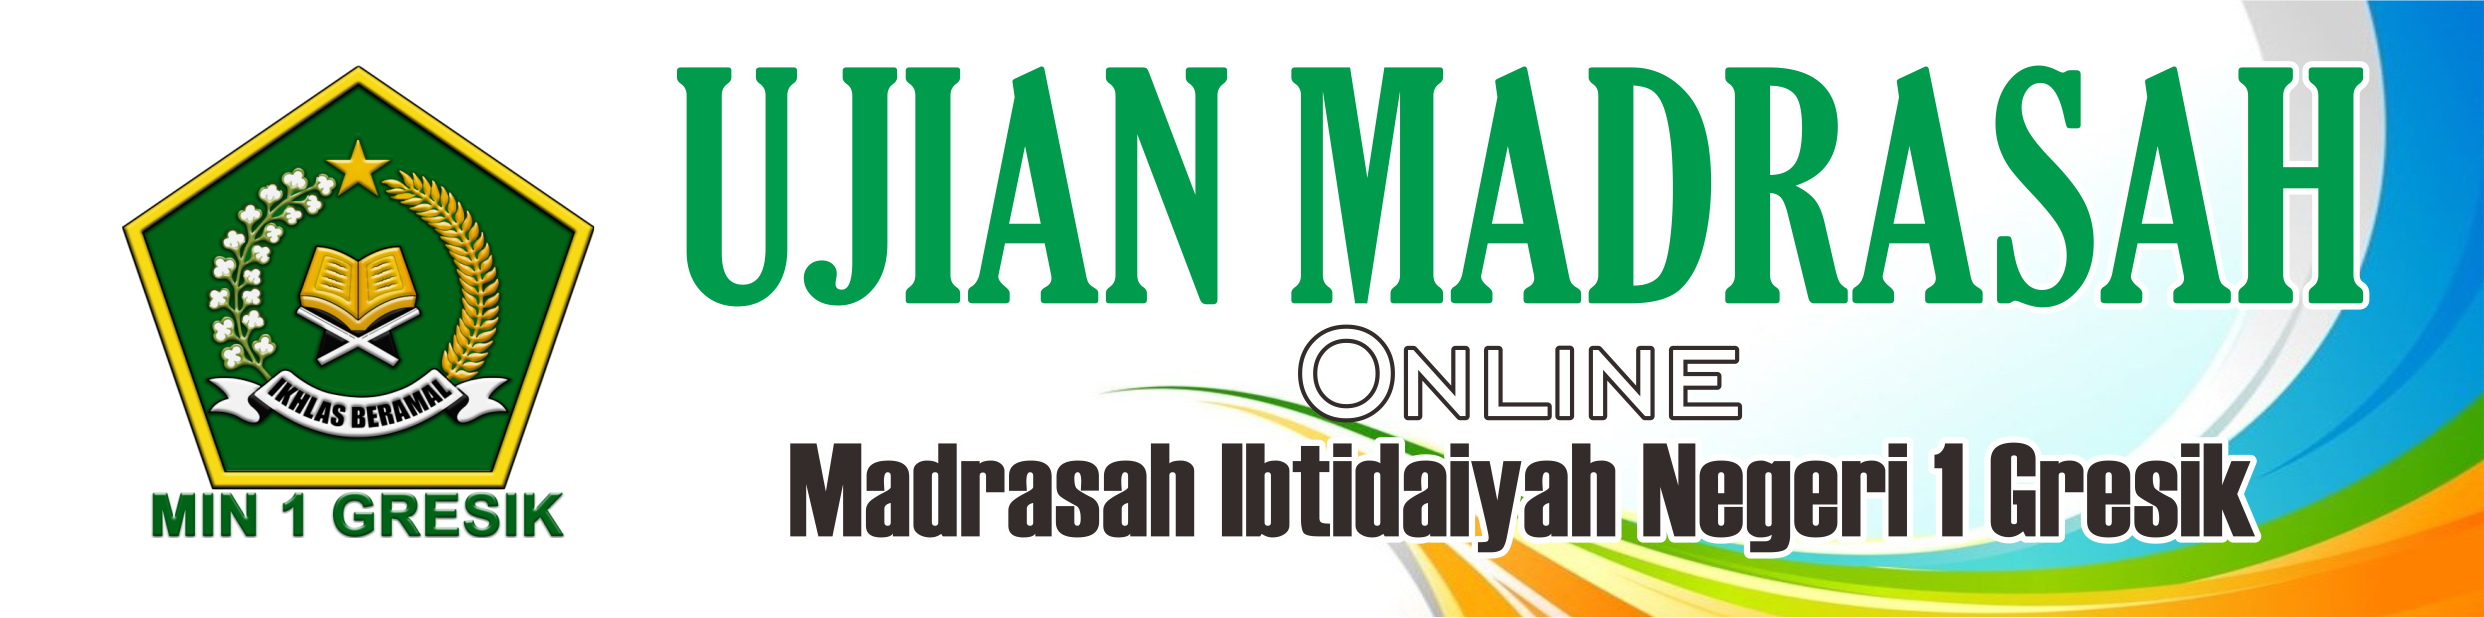 Ujian Madrasah Online